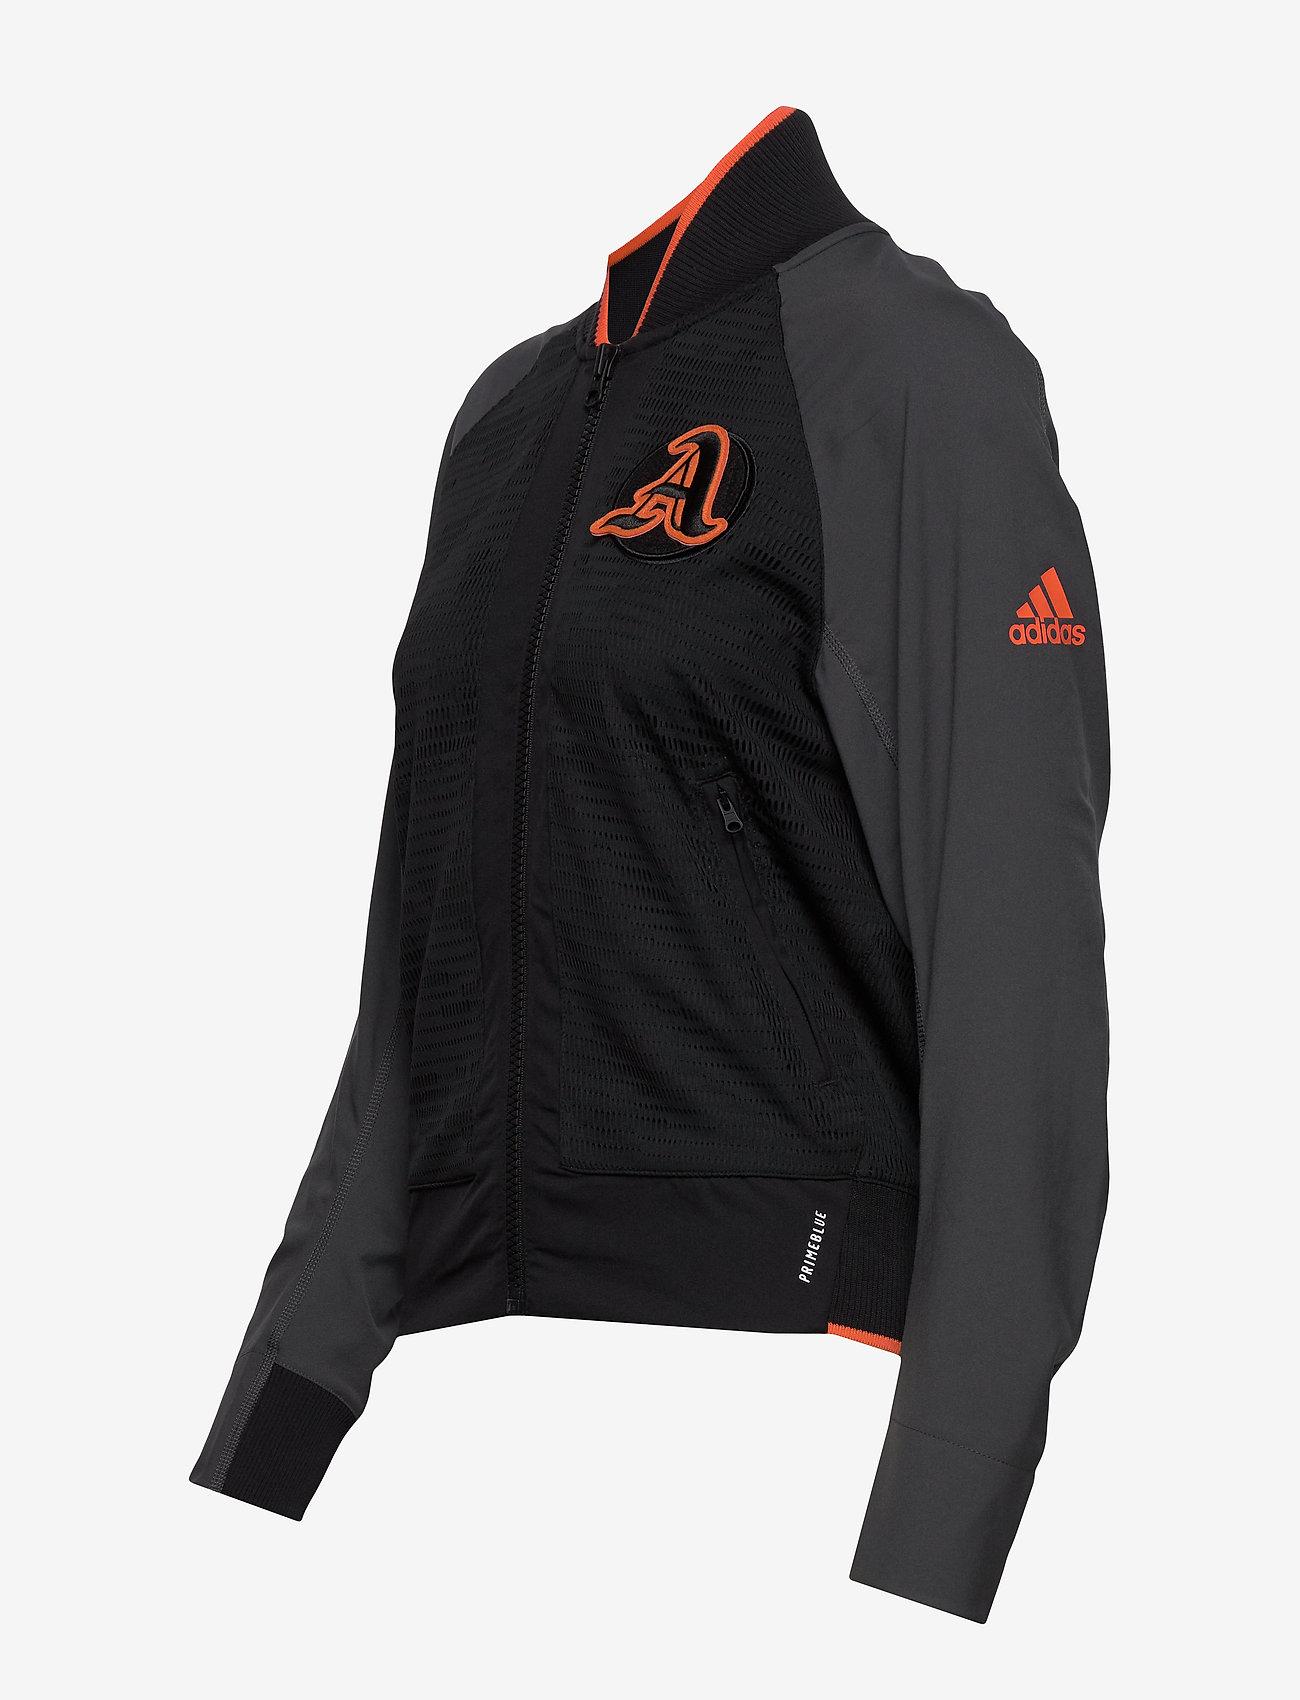 Vrct Jacket Primeblue (Grey) - adidas Tennis aBCyWn